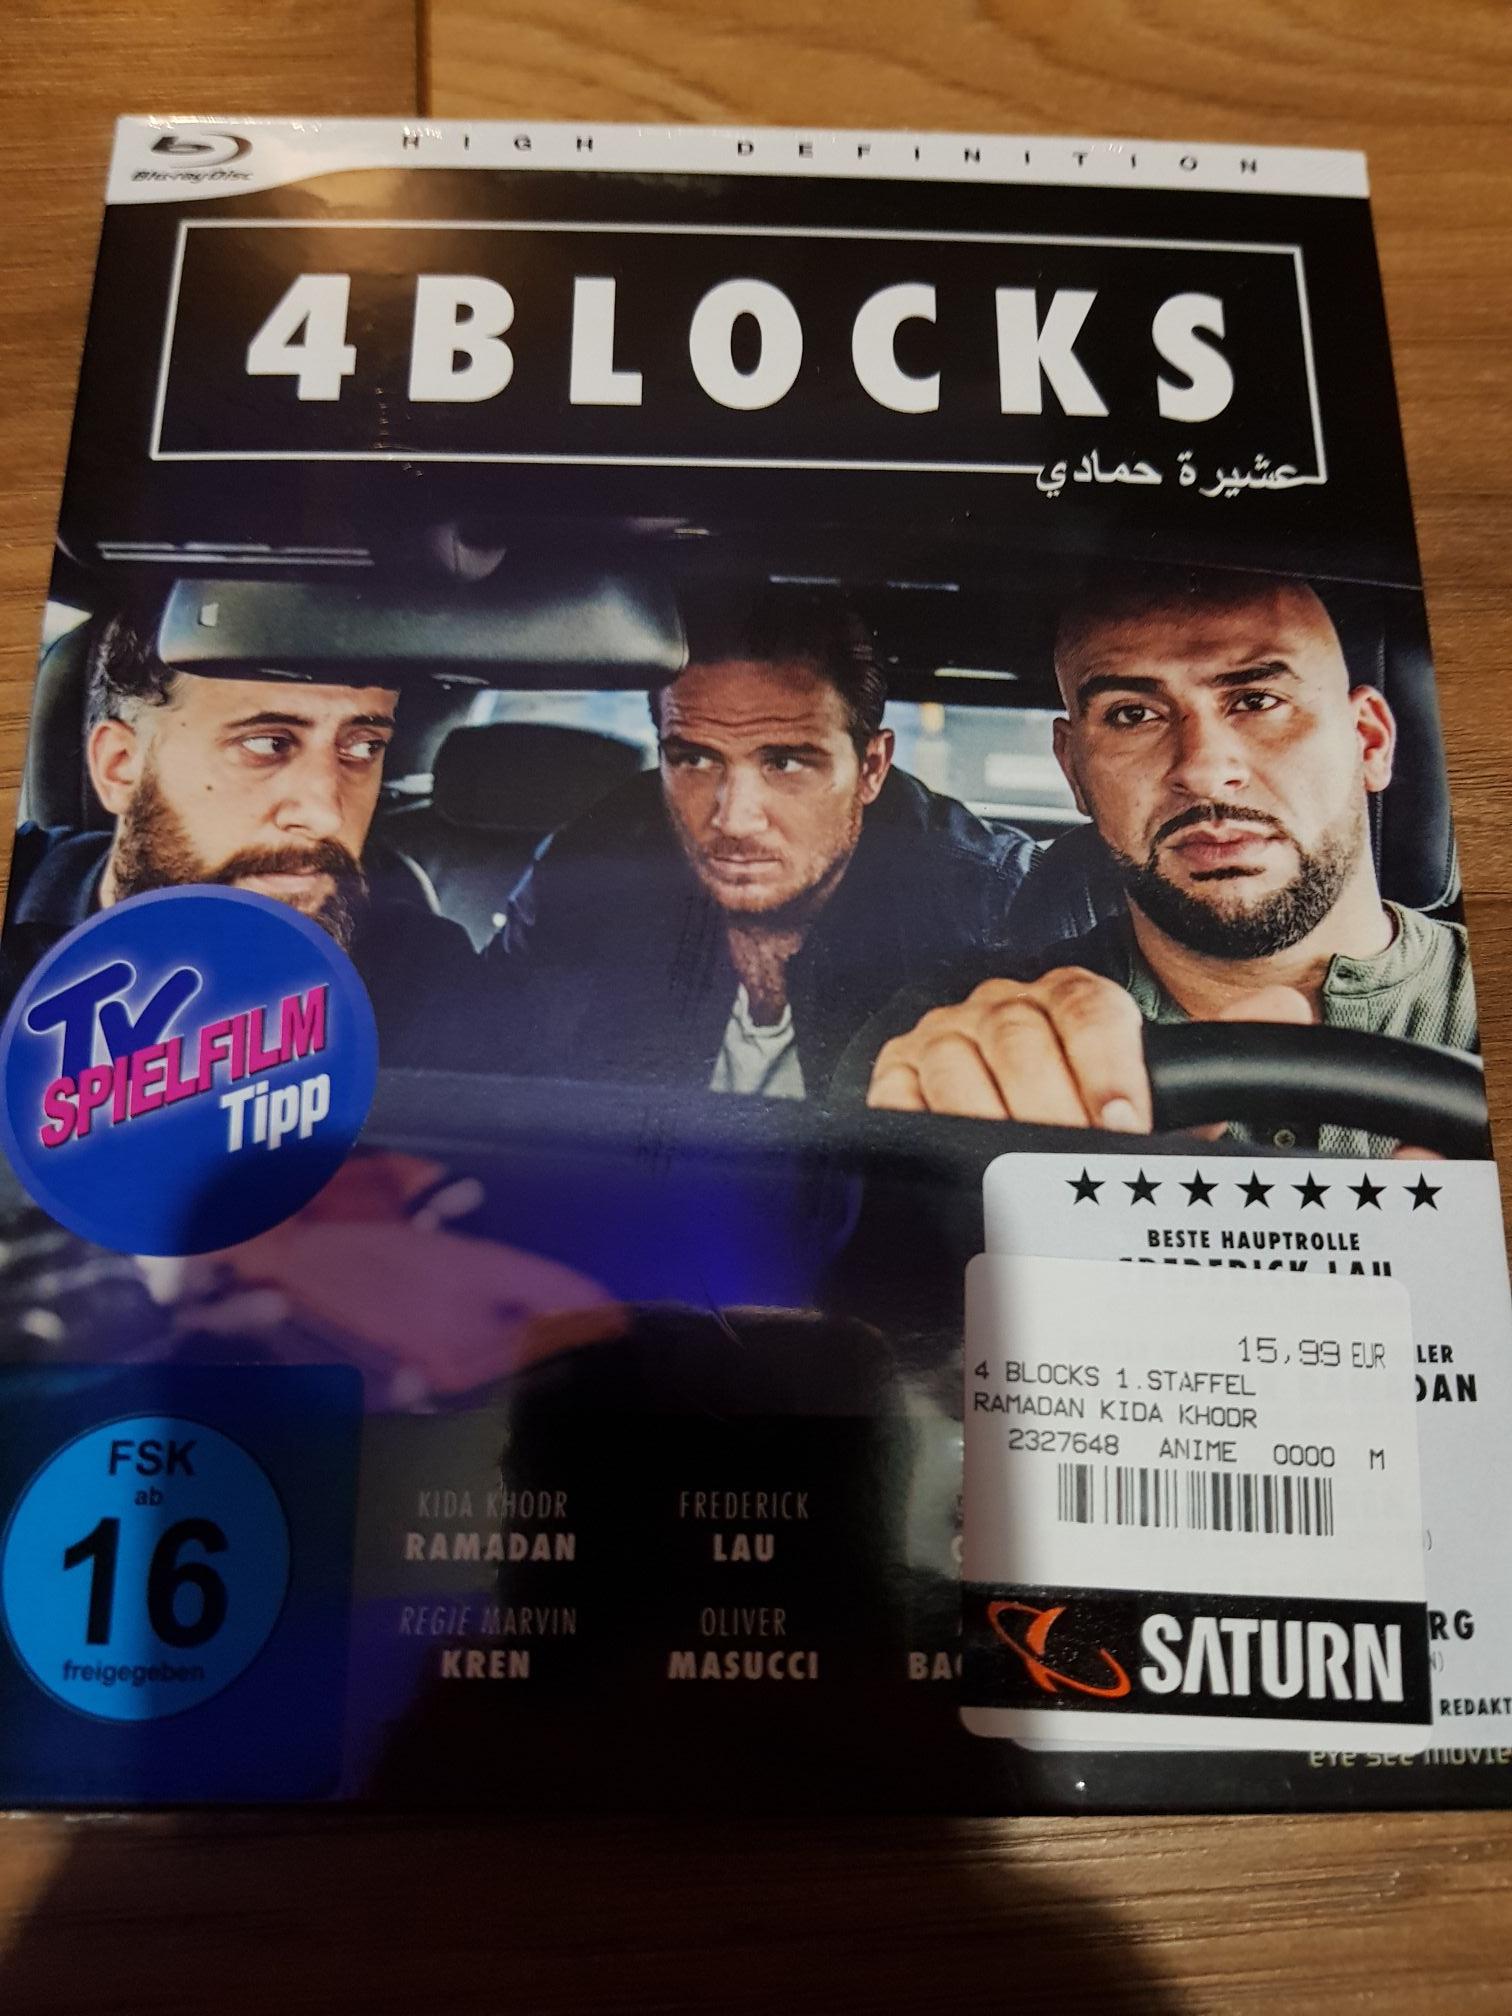 [Lokal Berlin?] 4 Blocks - komplette Serie auf 2 Blurays